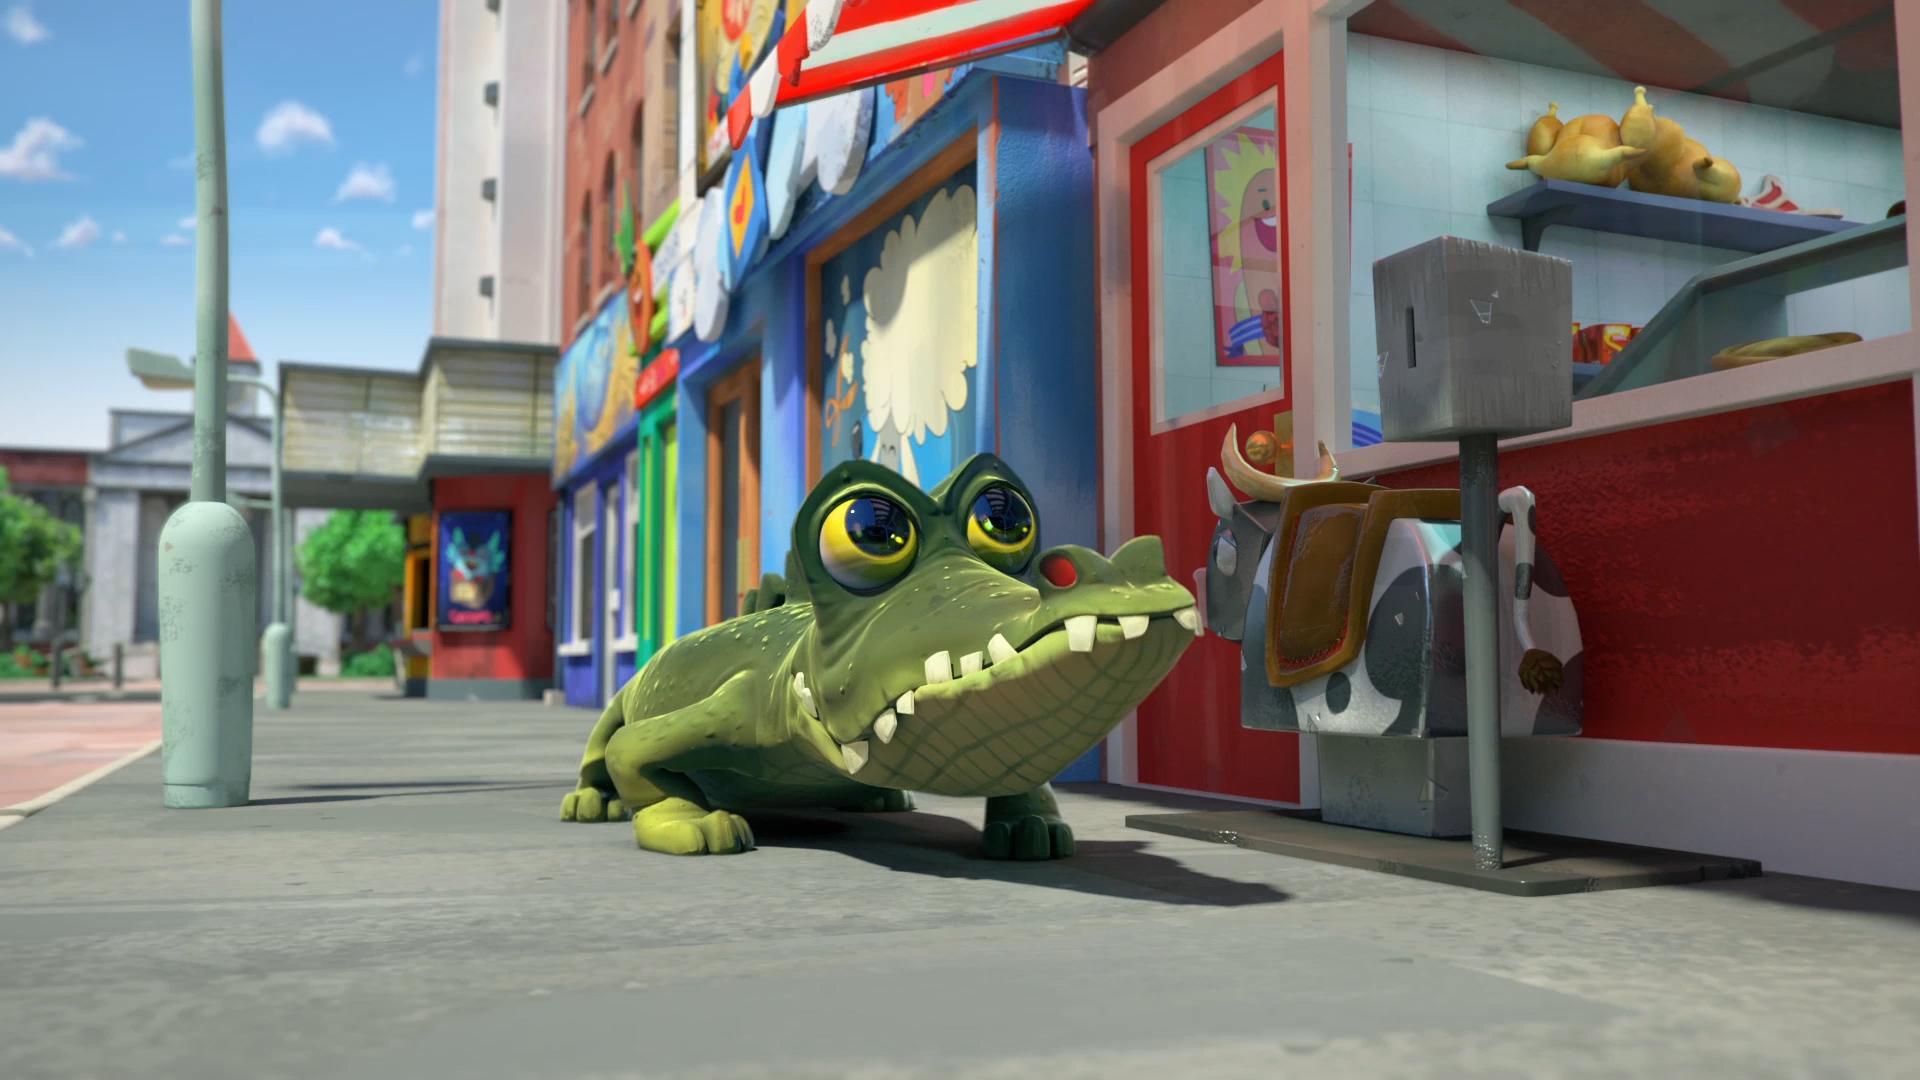 Butch Butcher's alligator!